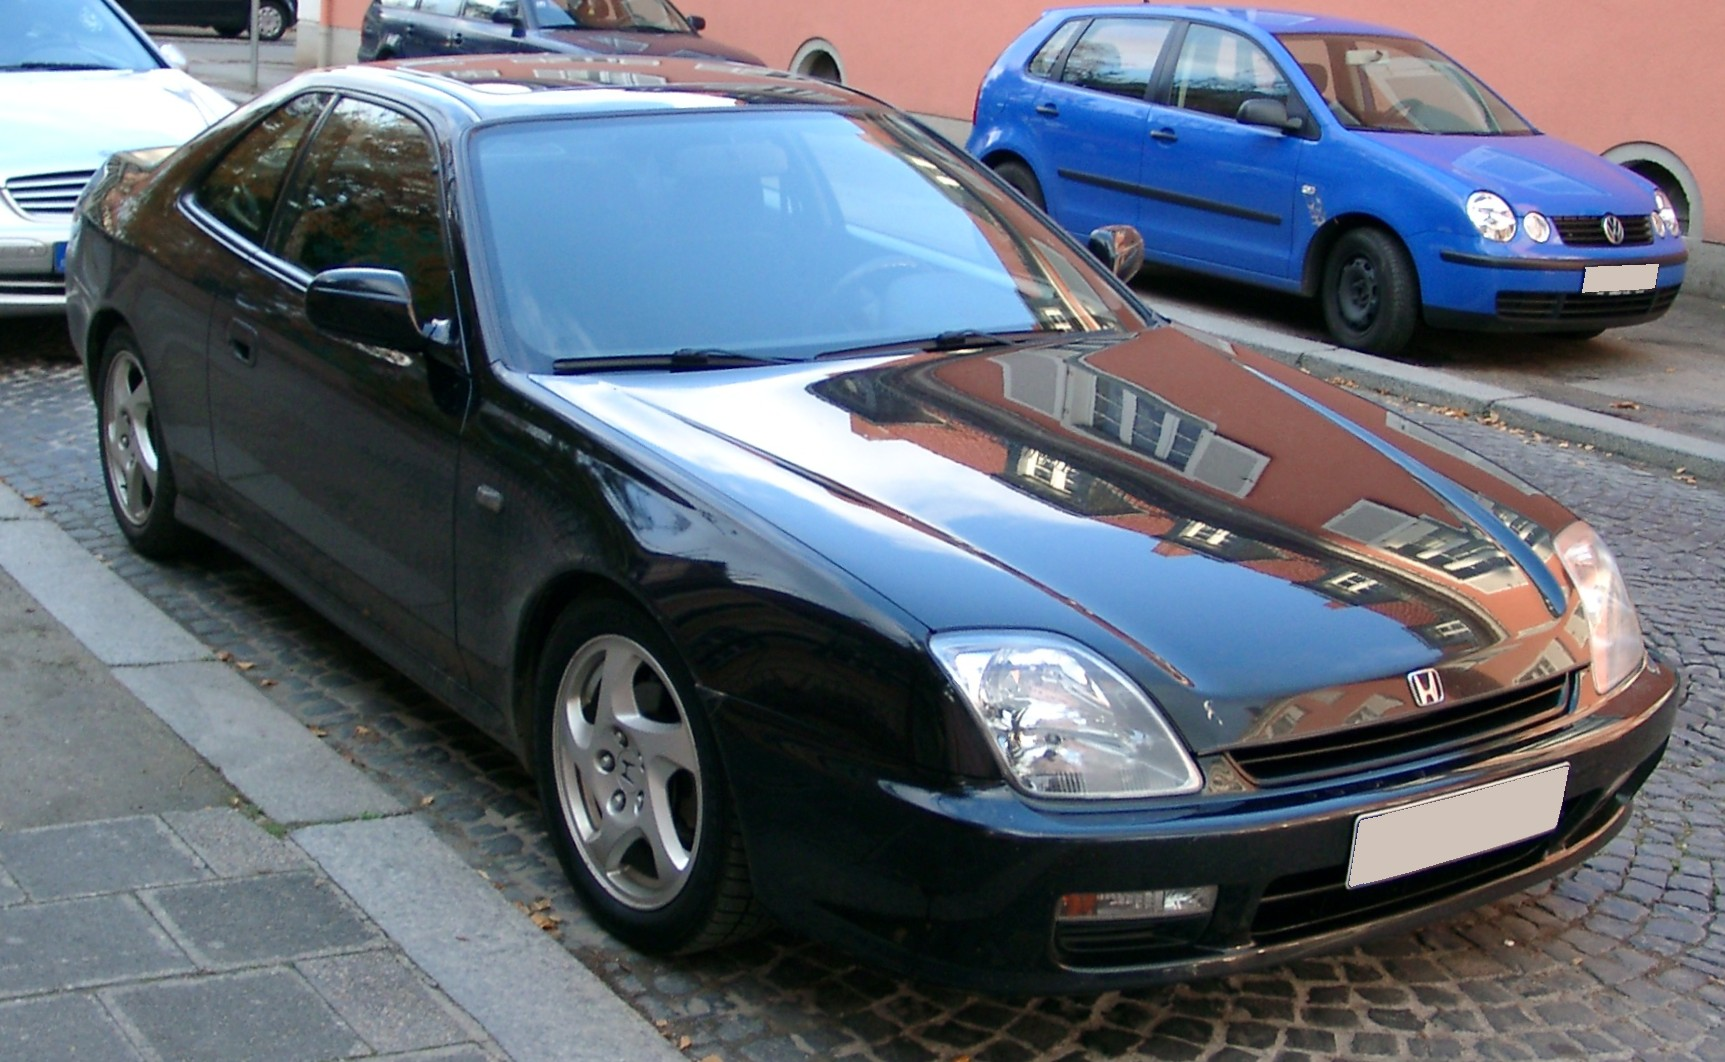 Honda Prelude Wiki >> File:Honda Prelude front 20071115.jpg - Wikimedia Commons